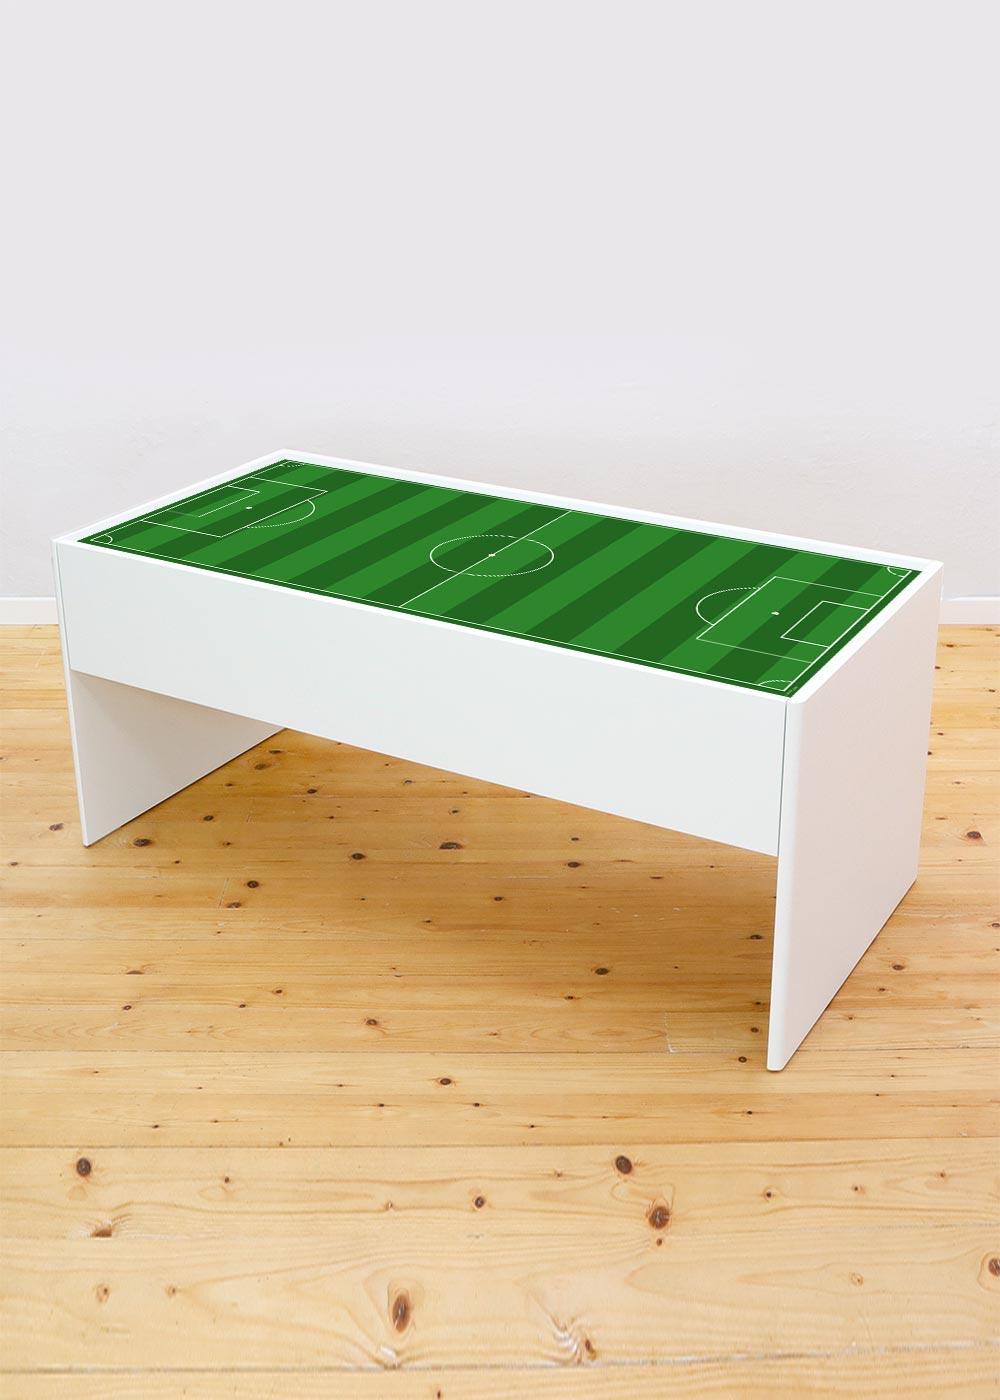 Ikea Dundra Spieltisch Fussballfeld gün Komplettansicht